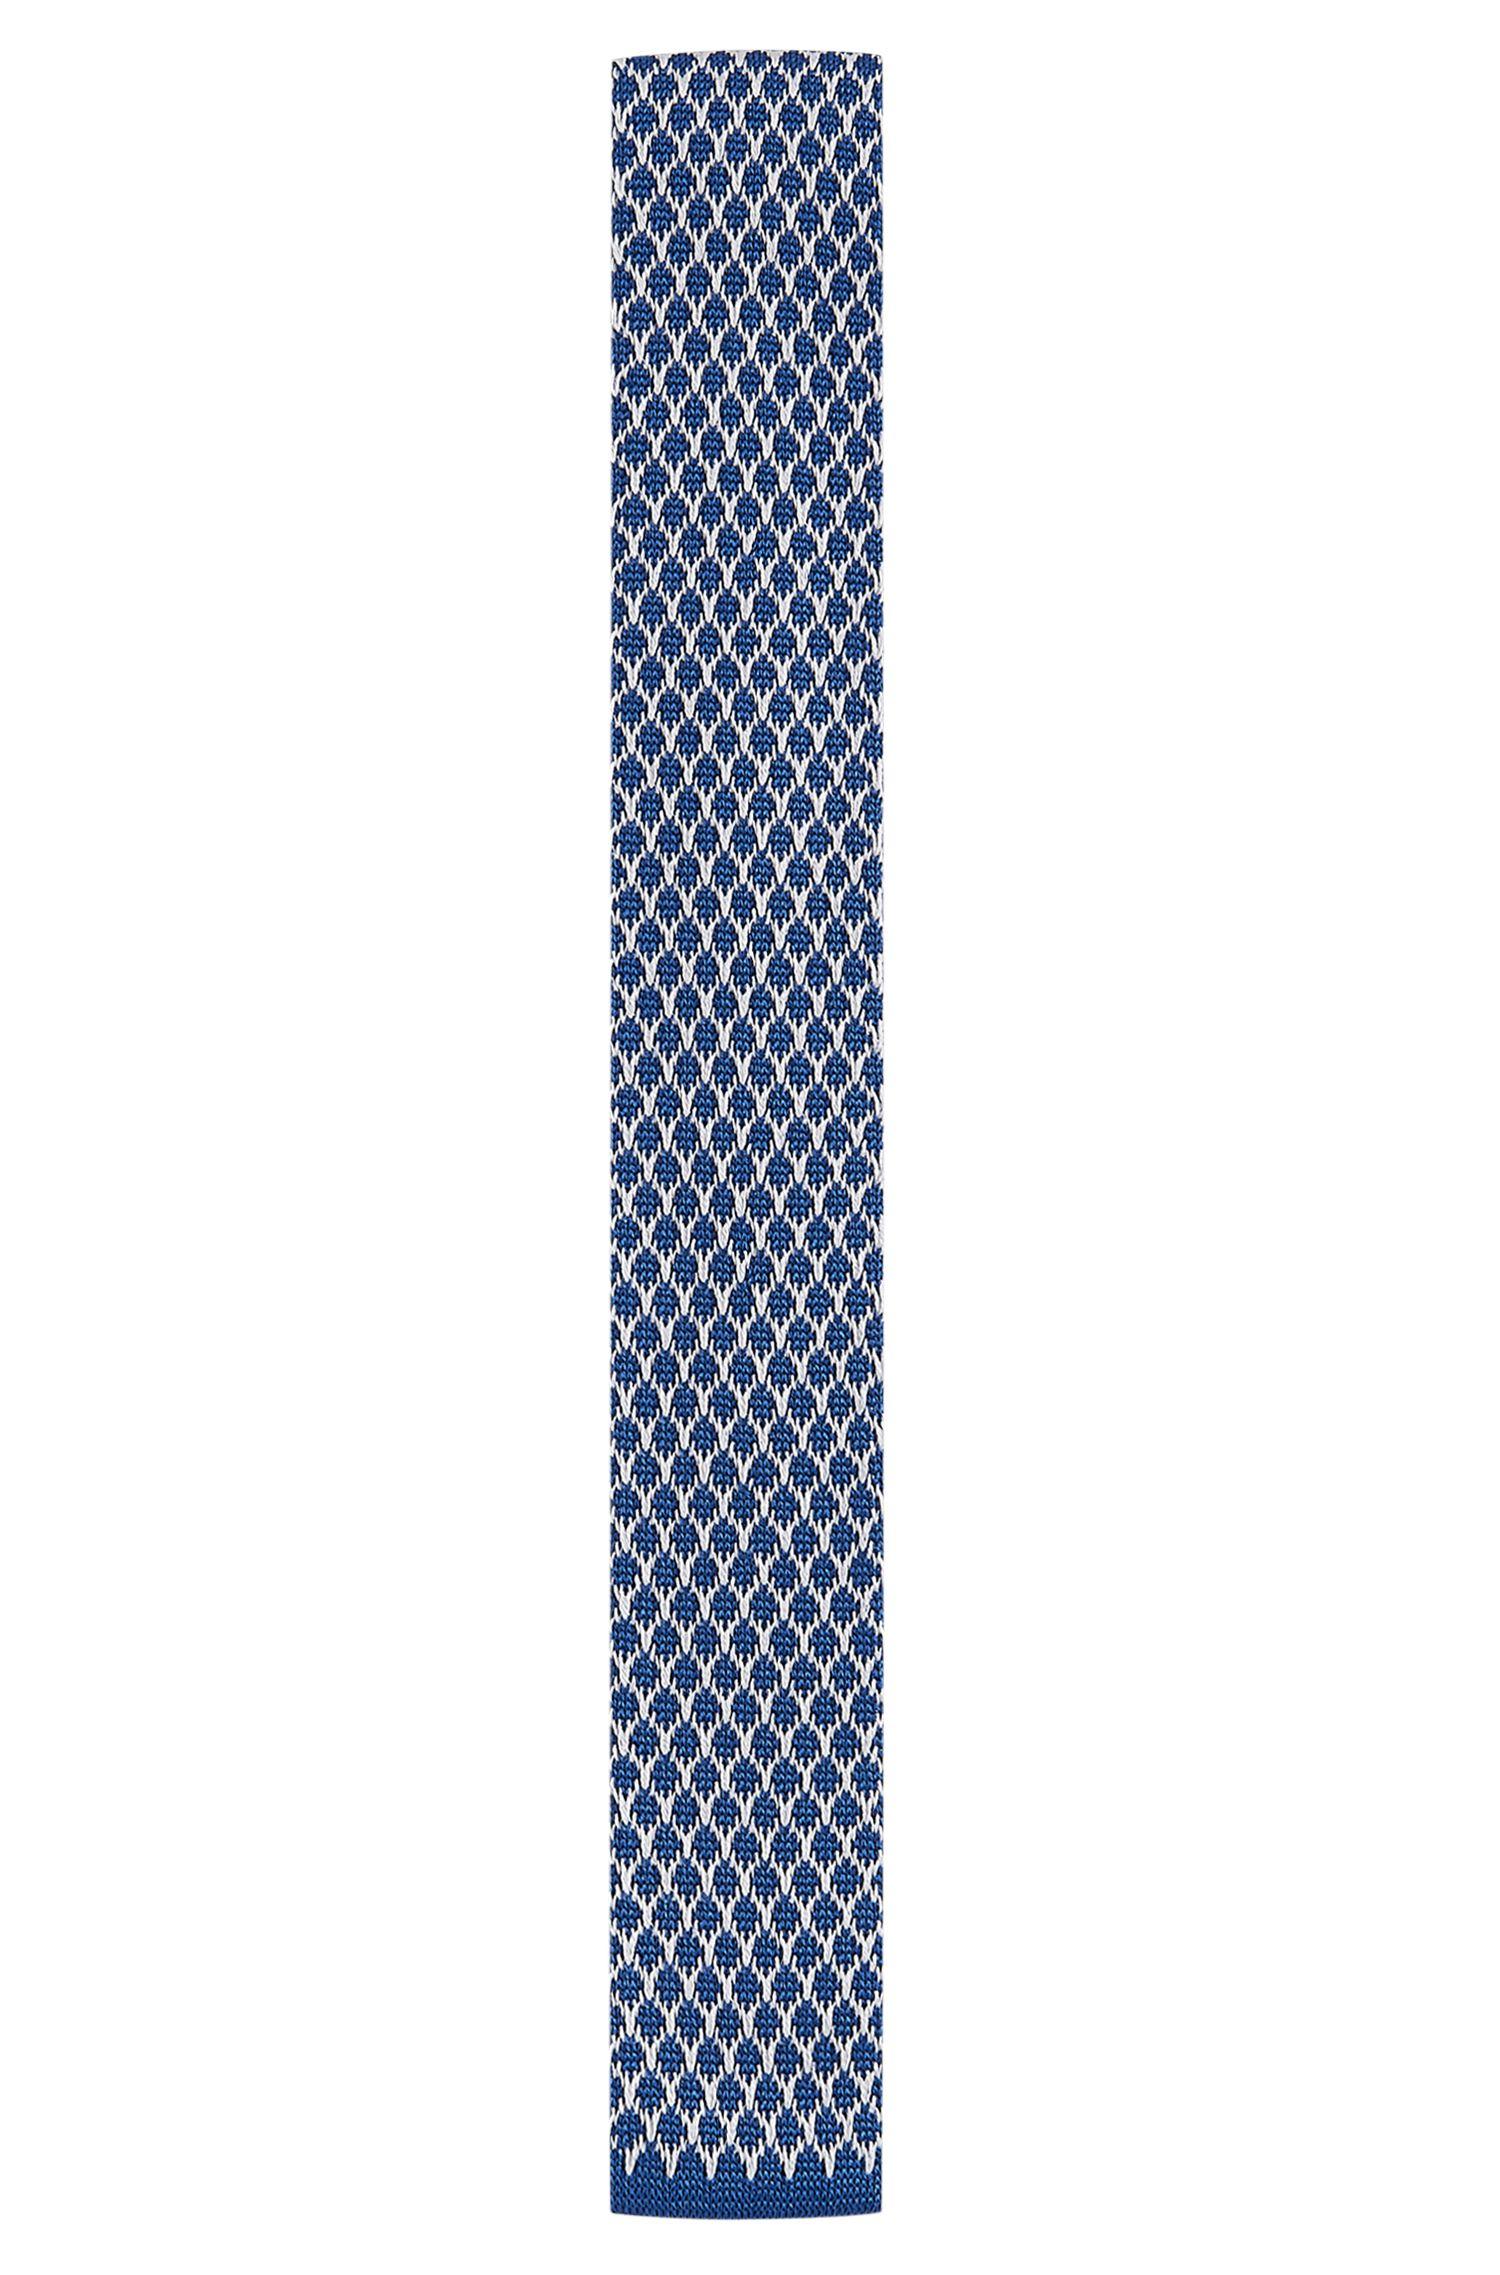 'Tie 5 cm Knitted'   Cotton Knit Tie